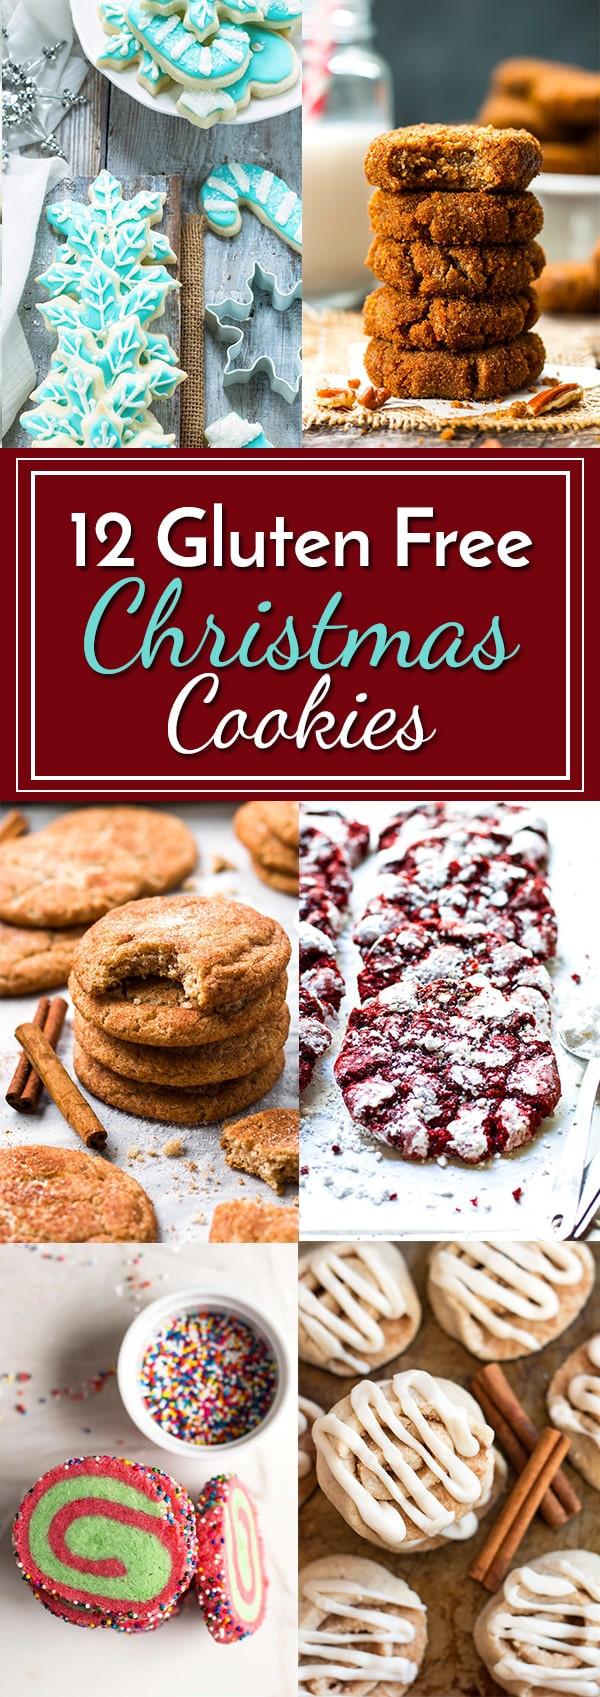 Dairy Free Christmas Cookies  12 Gluten Free Christmas Cookies Evolving Table